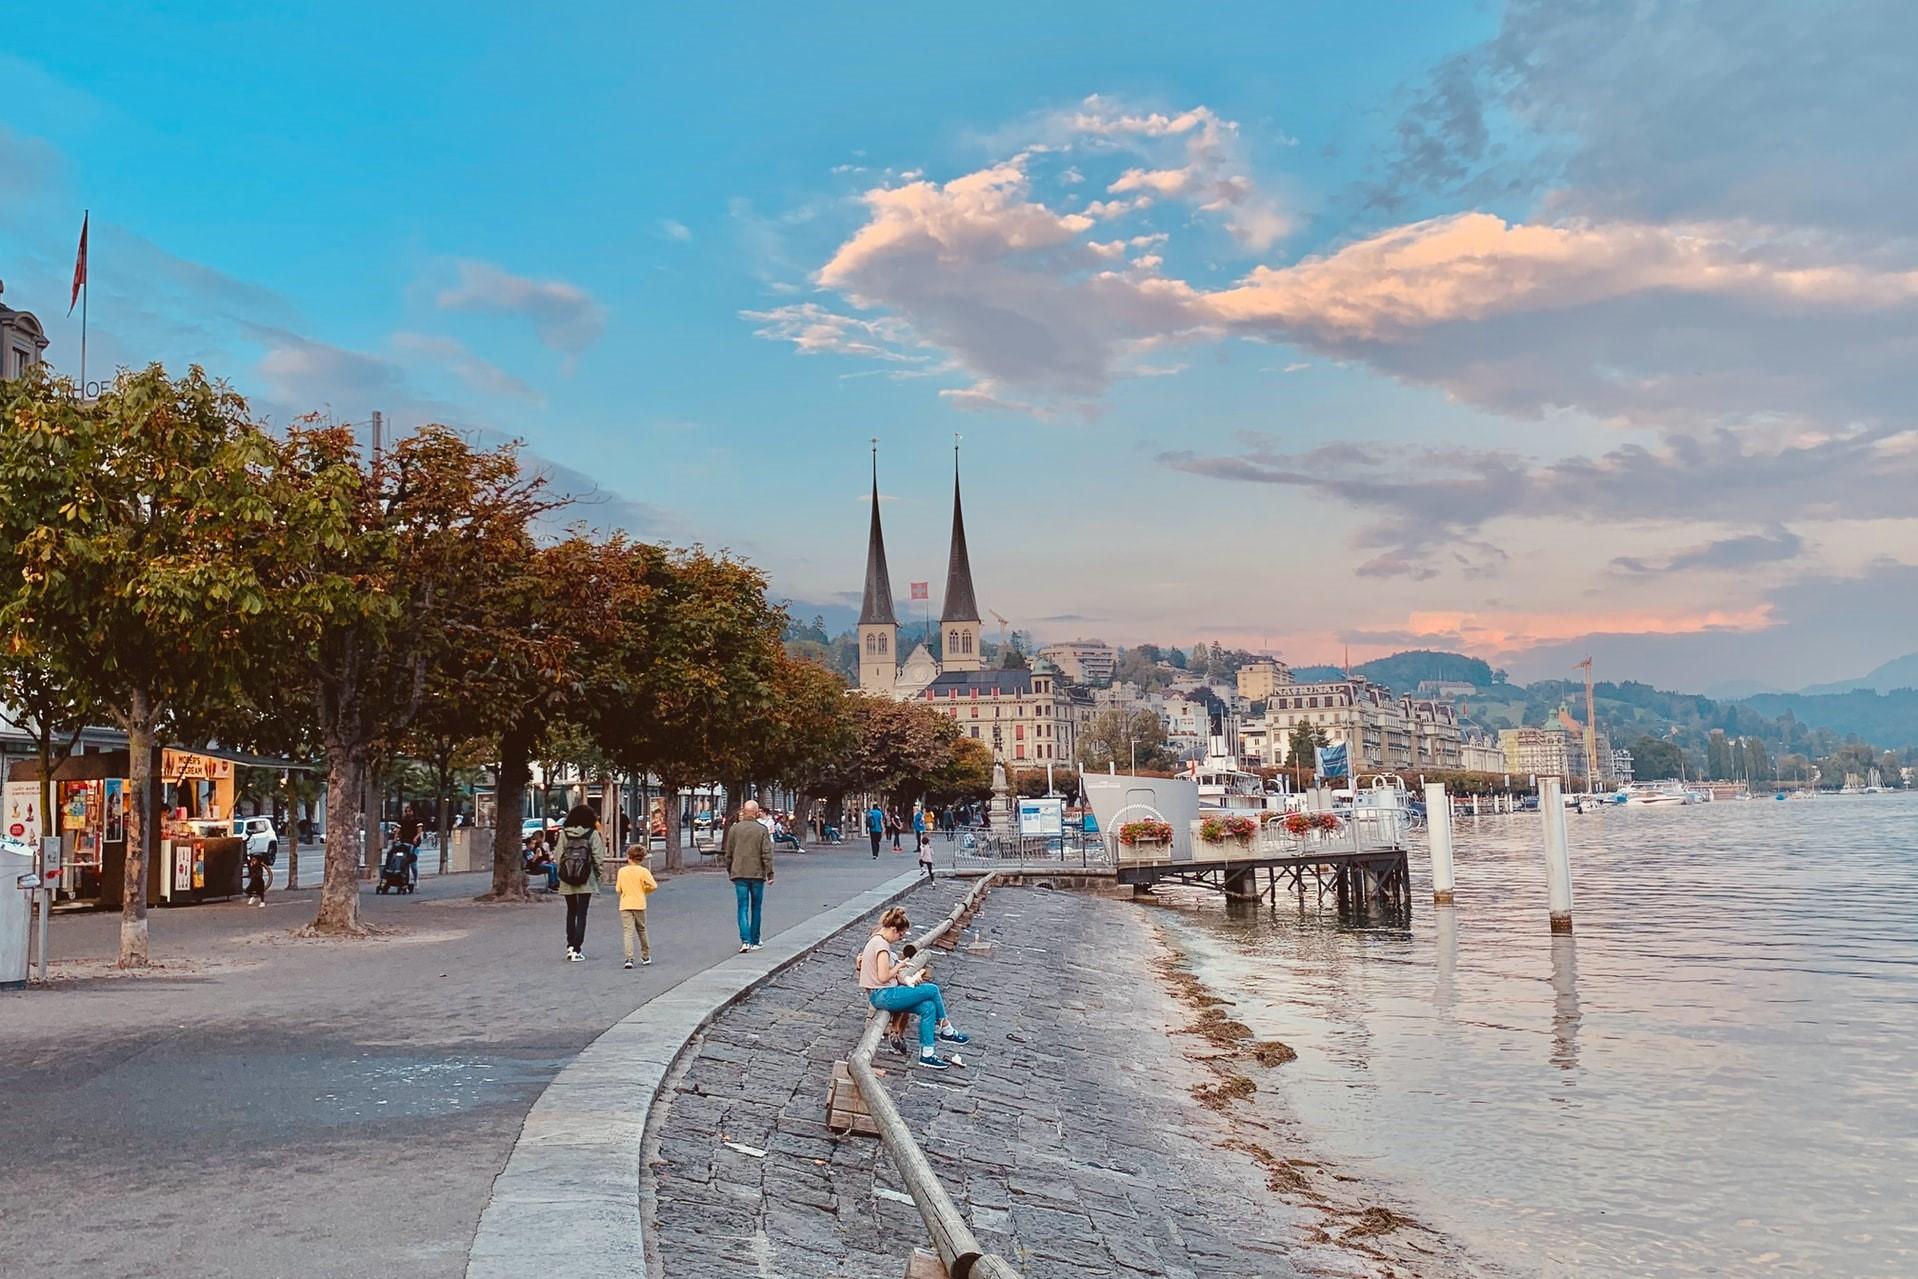 Schweiz Luzern Promenade